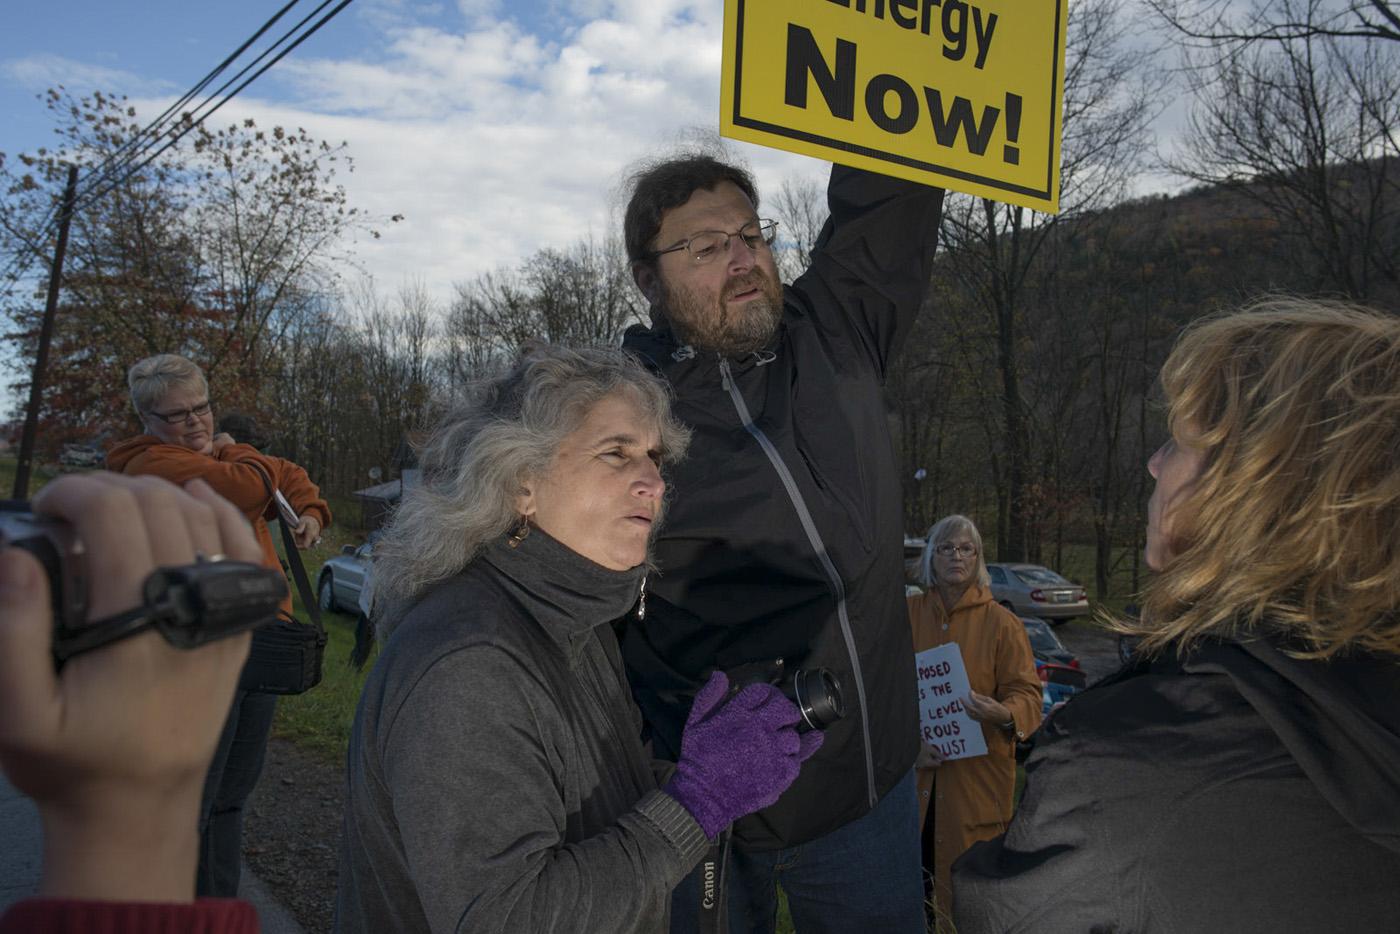 Vera Scroggins at an anti-drilling event.  © Nina Berman/MSDP 2015